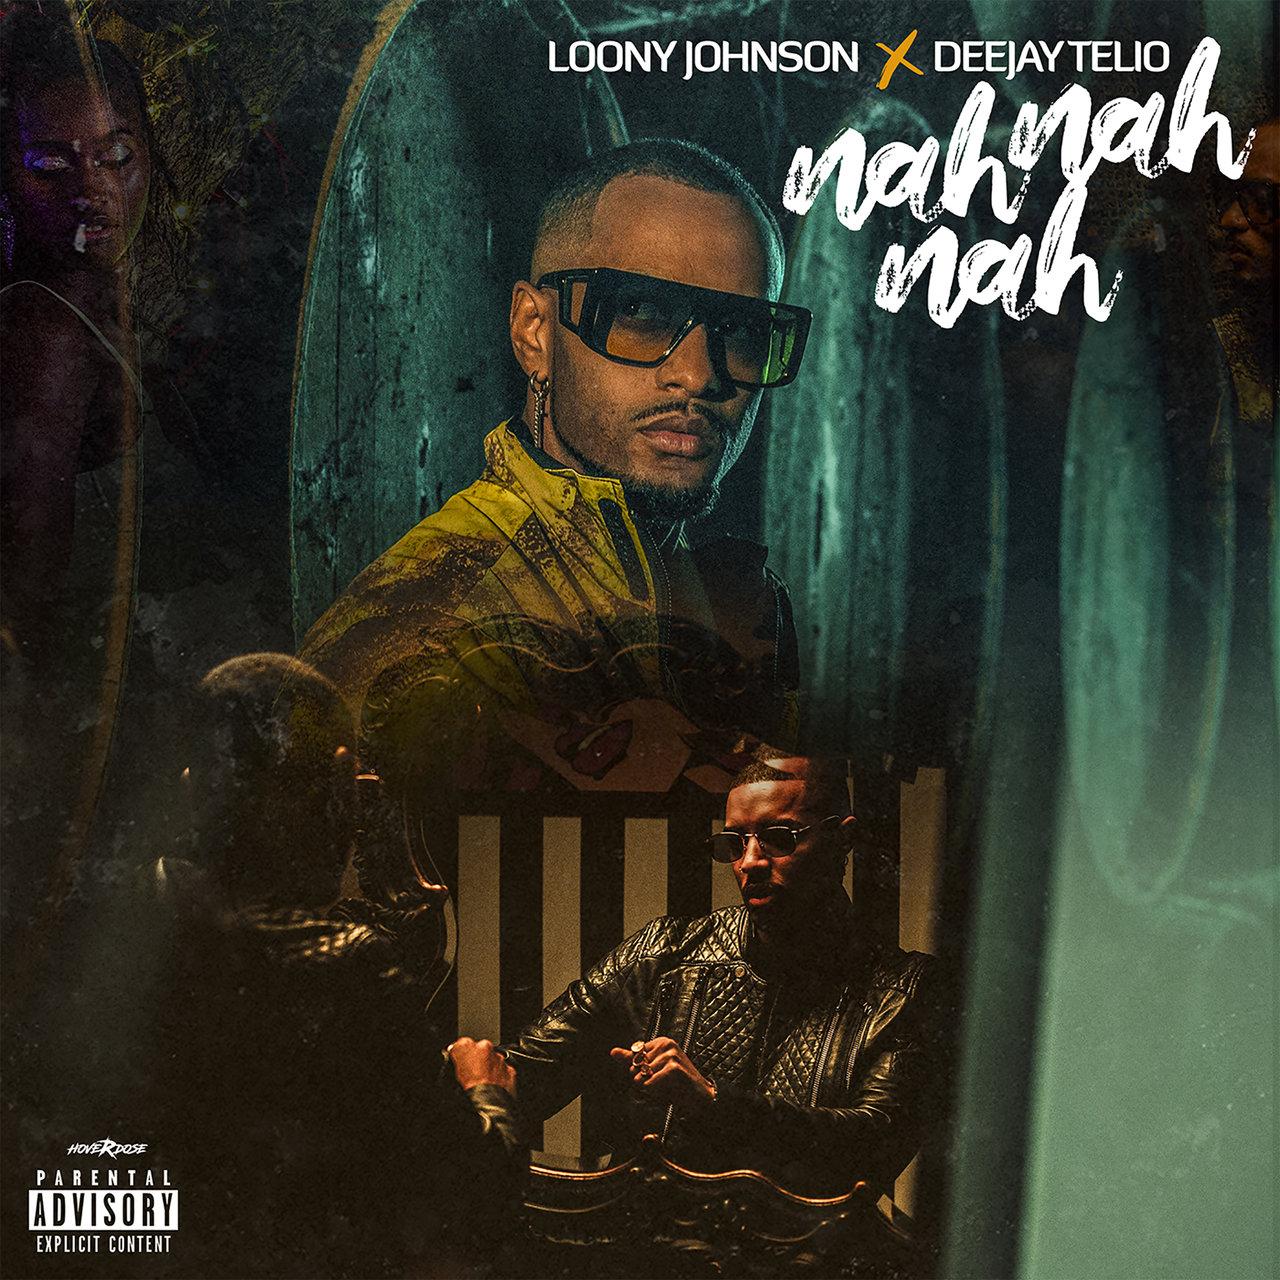 Loony Johnson - Nah Nah Nah (ft. Deejay Telio) (Cover)